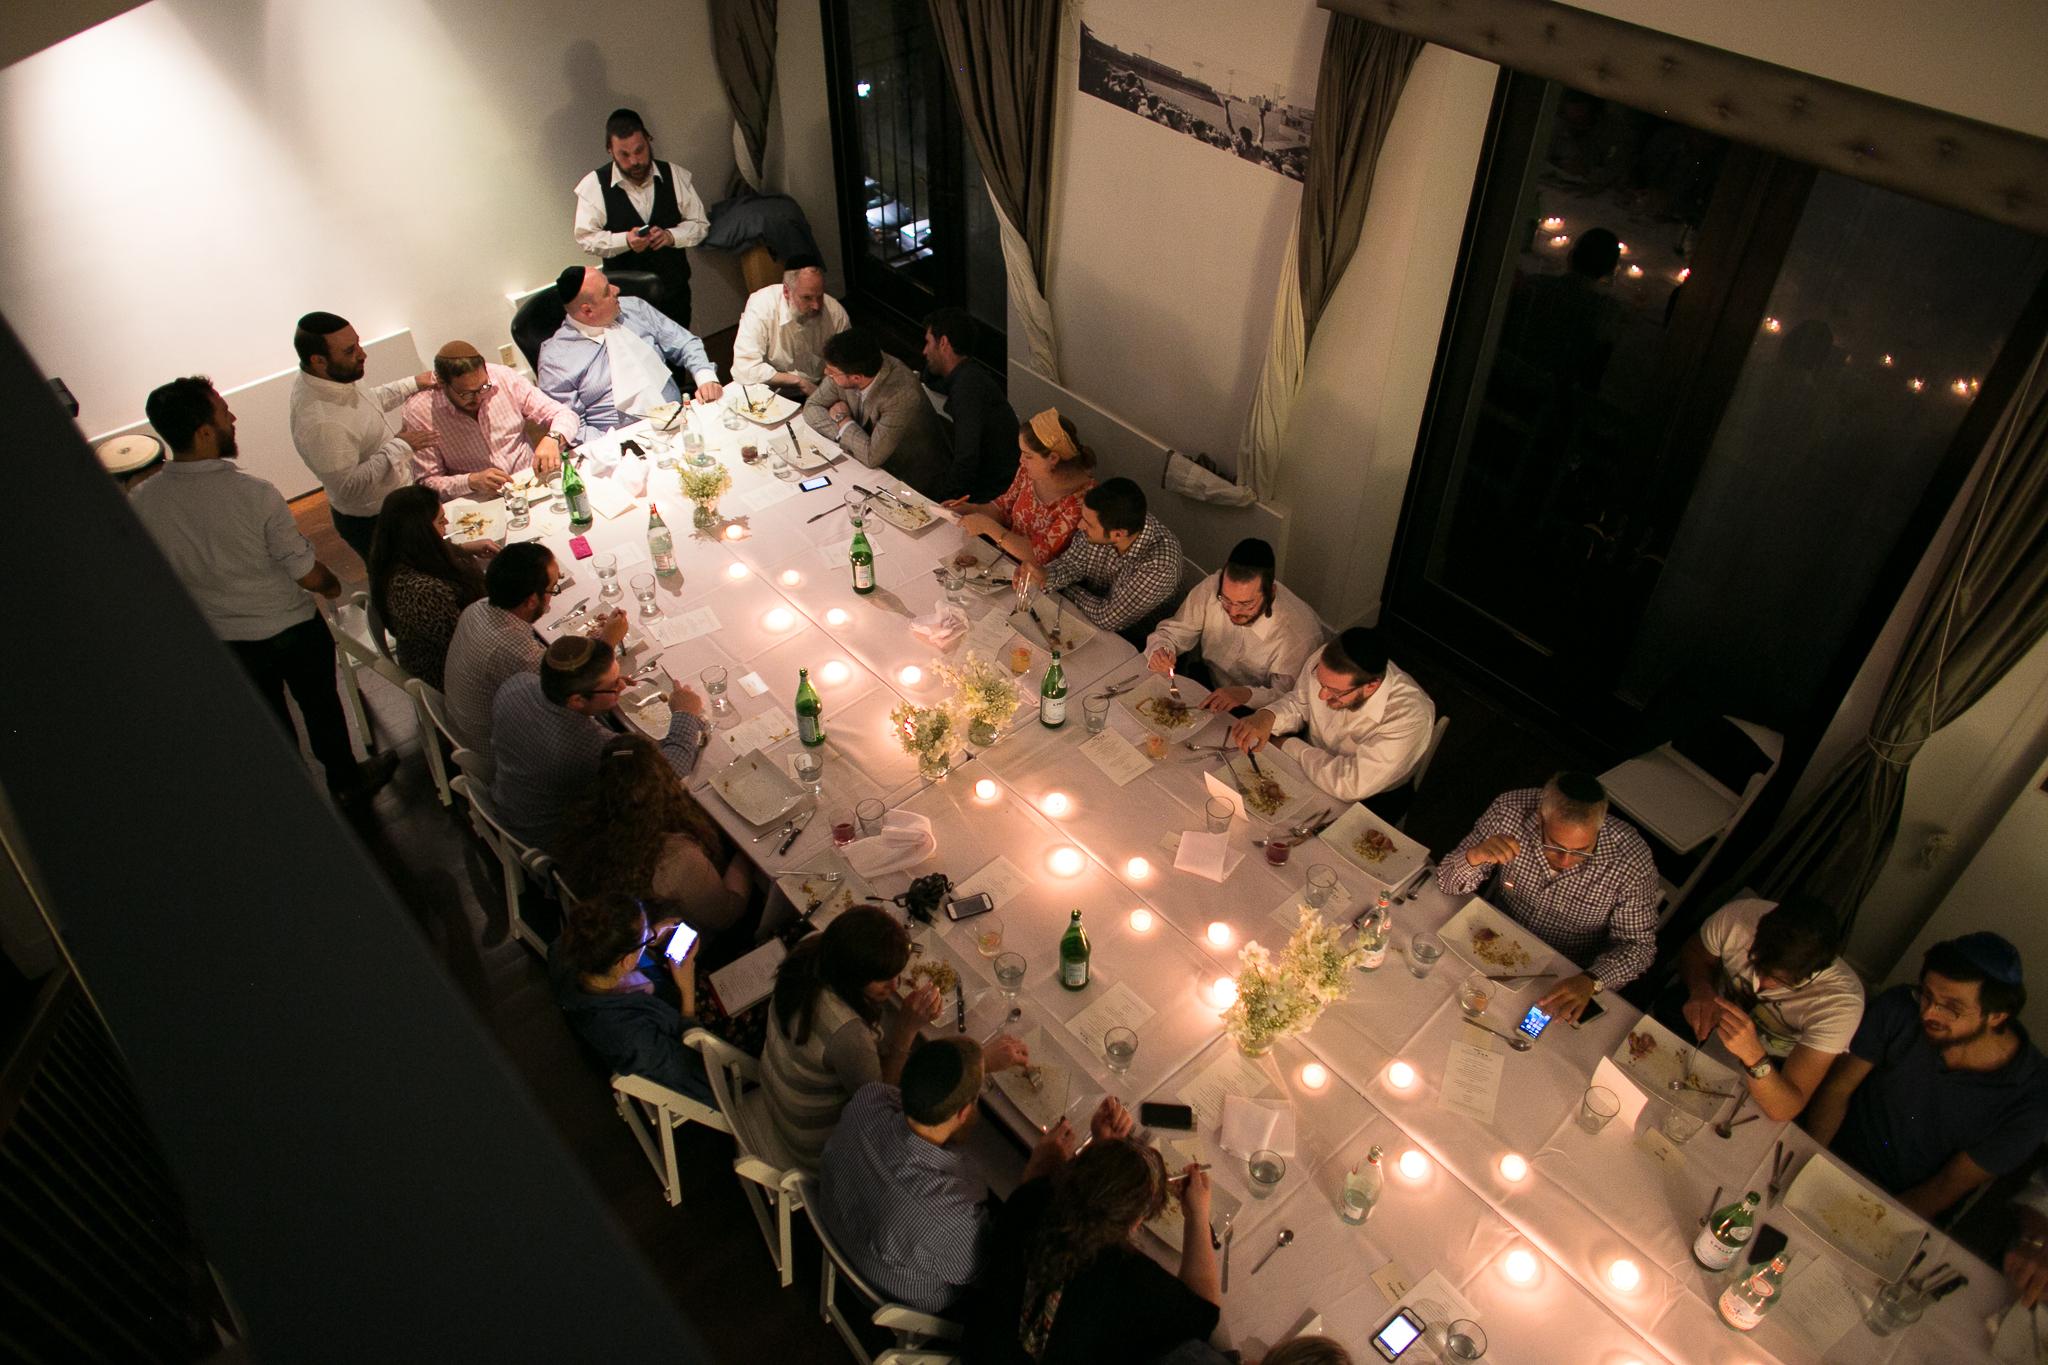 Kosher _ Supper _ Kitchensurfing-159.jpg